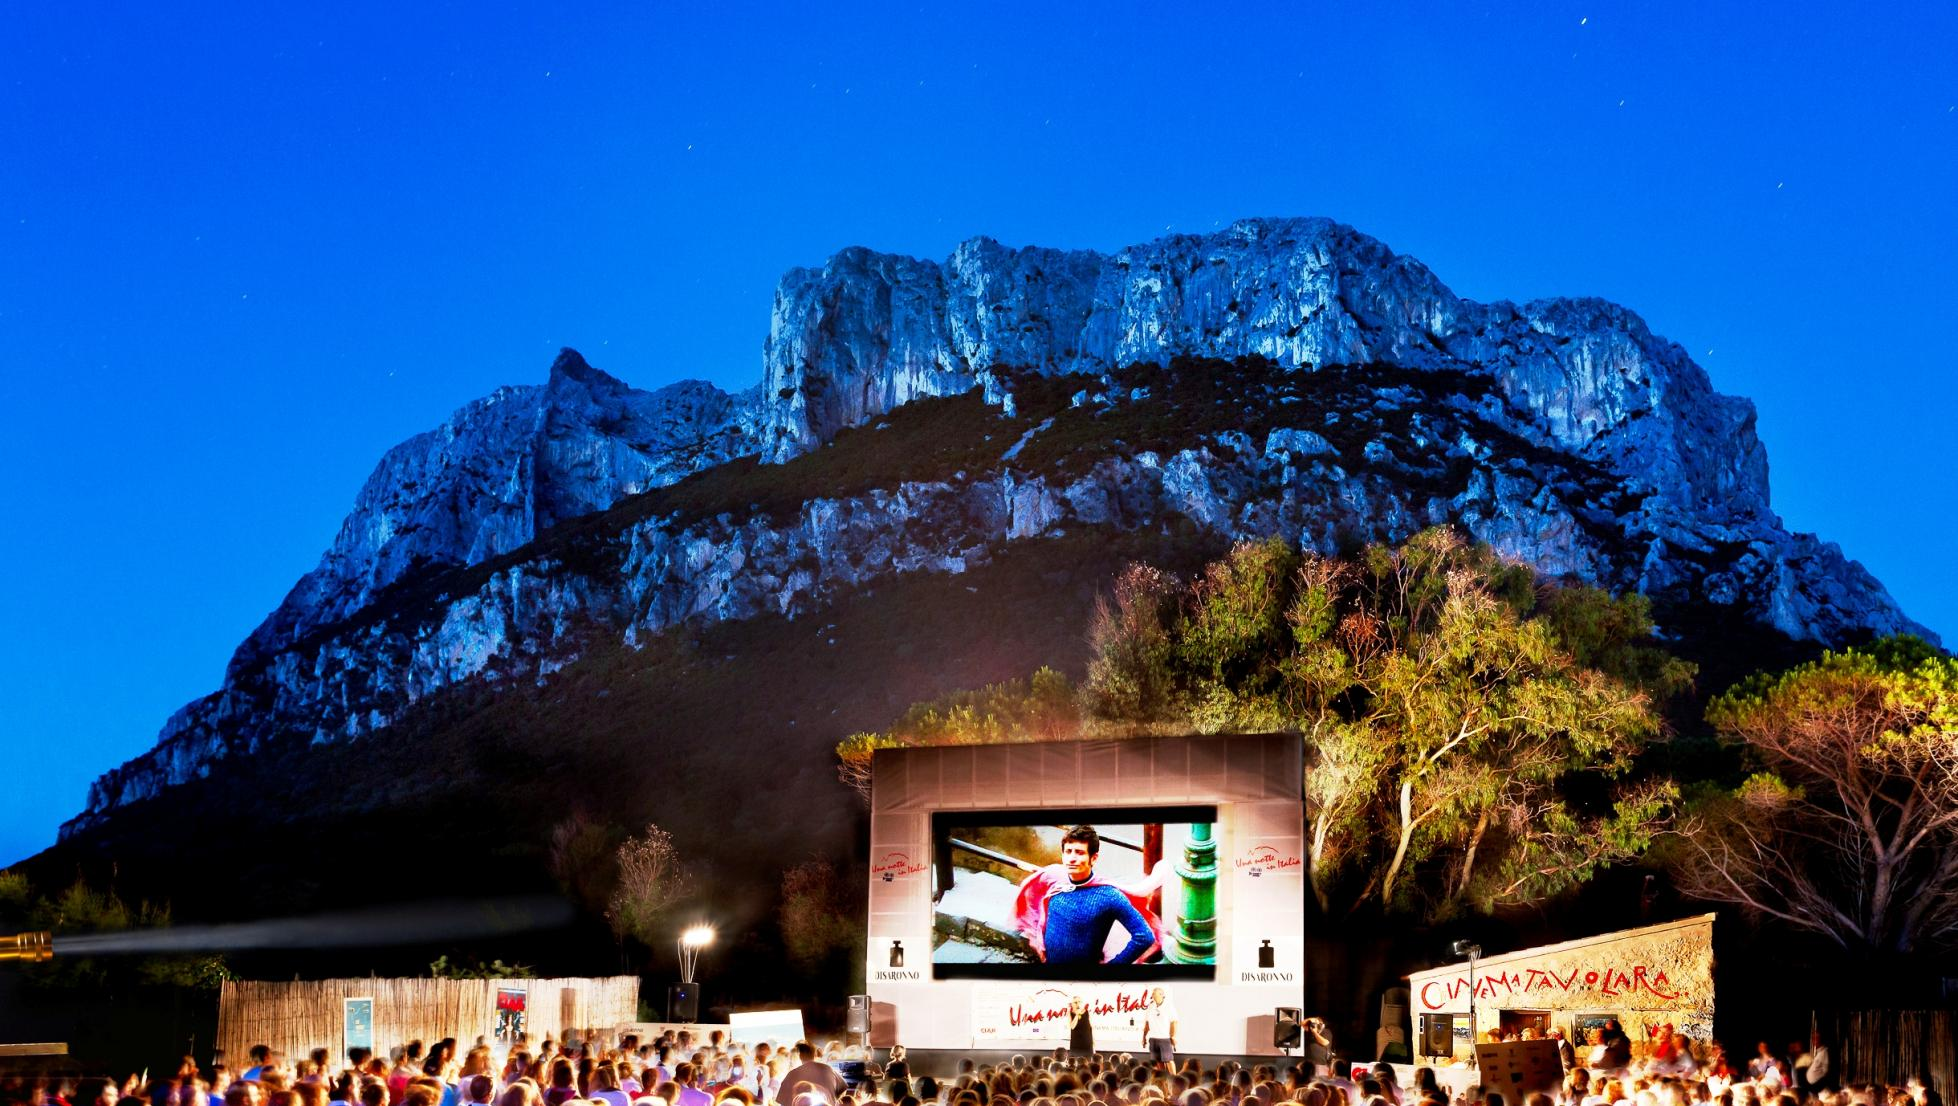 Una Notte in Italia 2013 - Tavolara